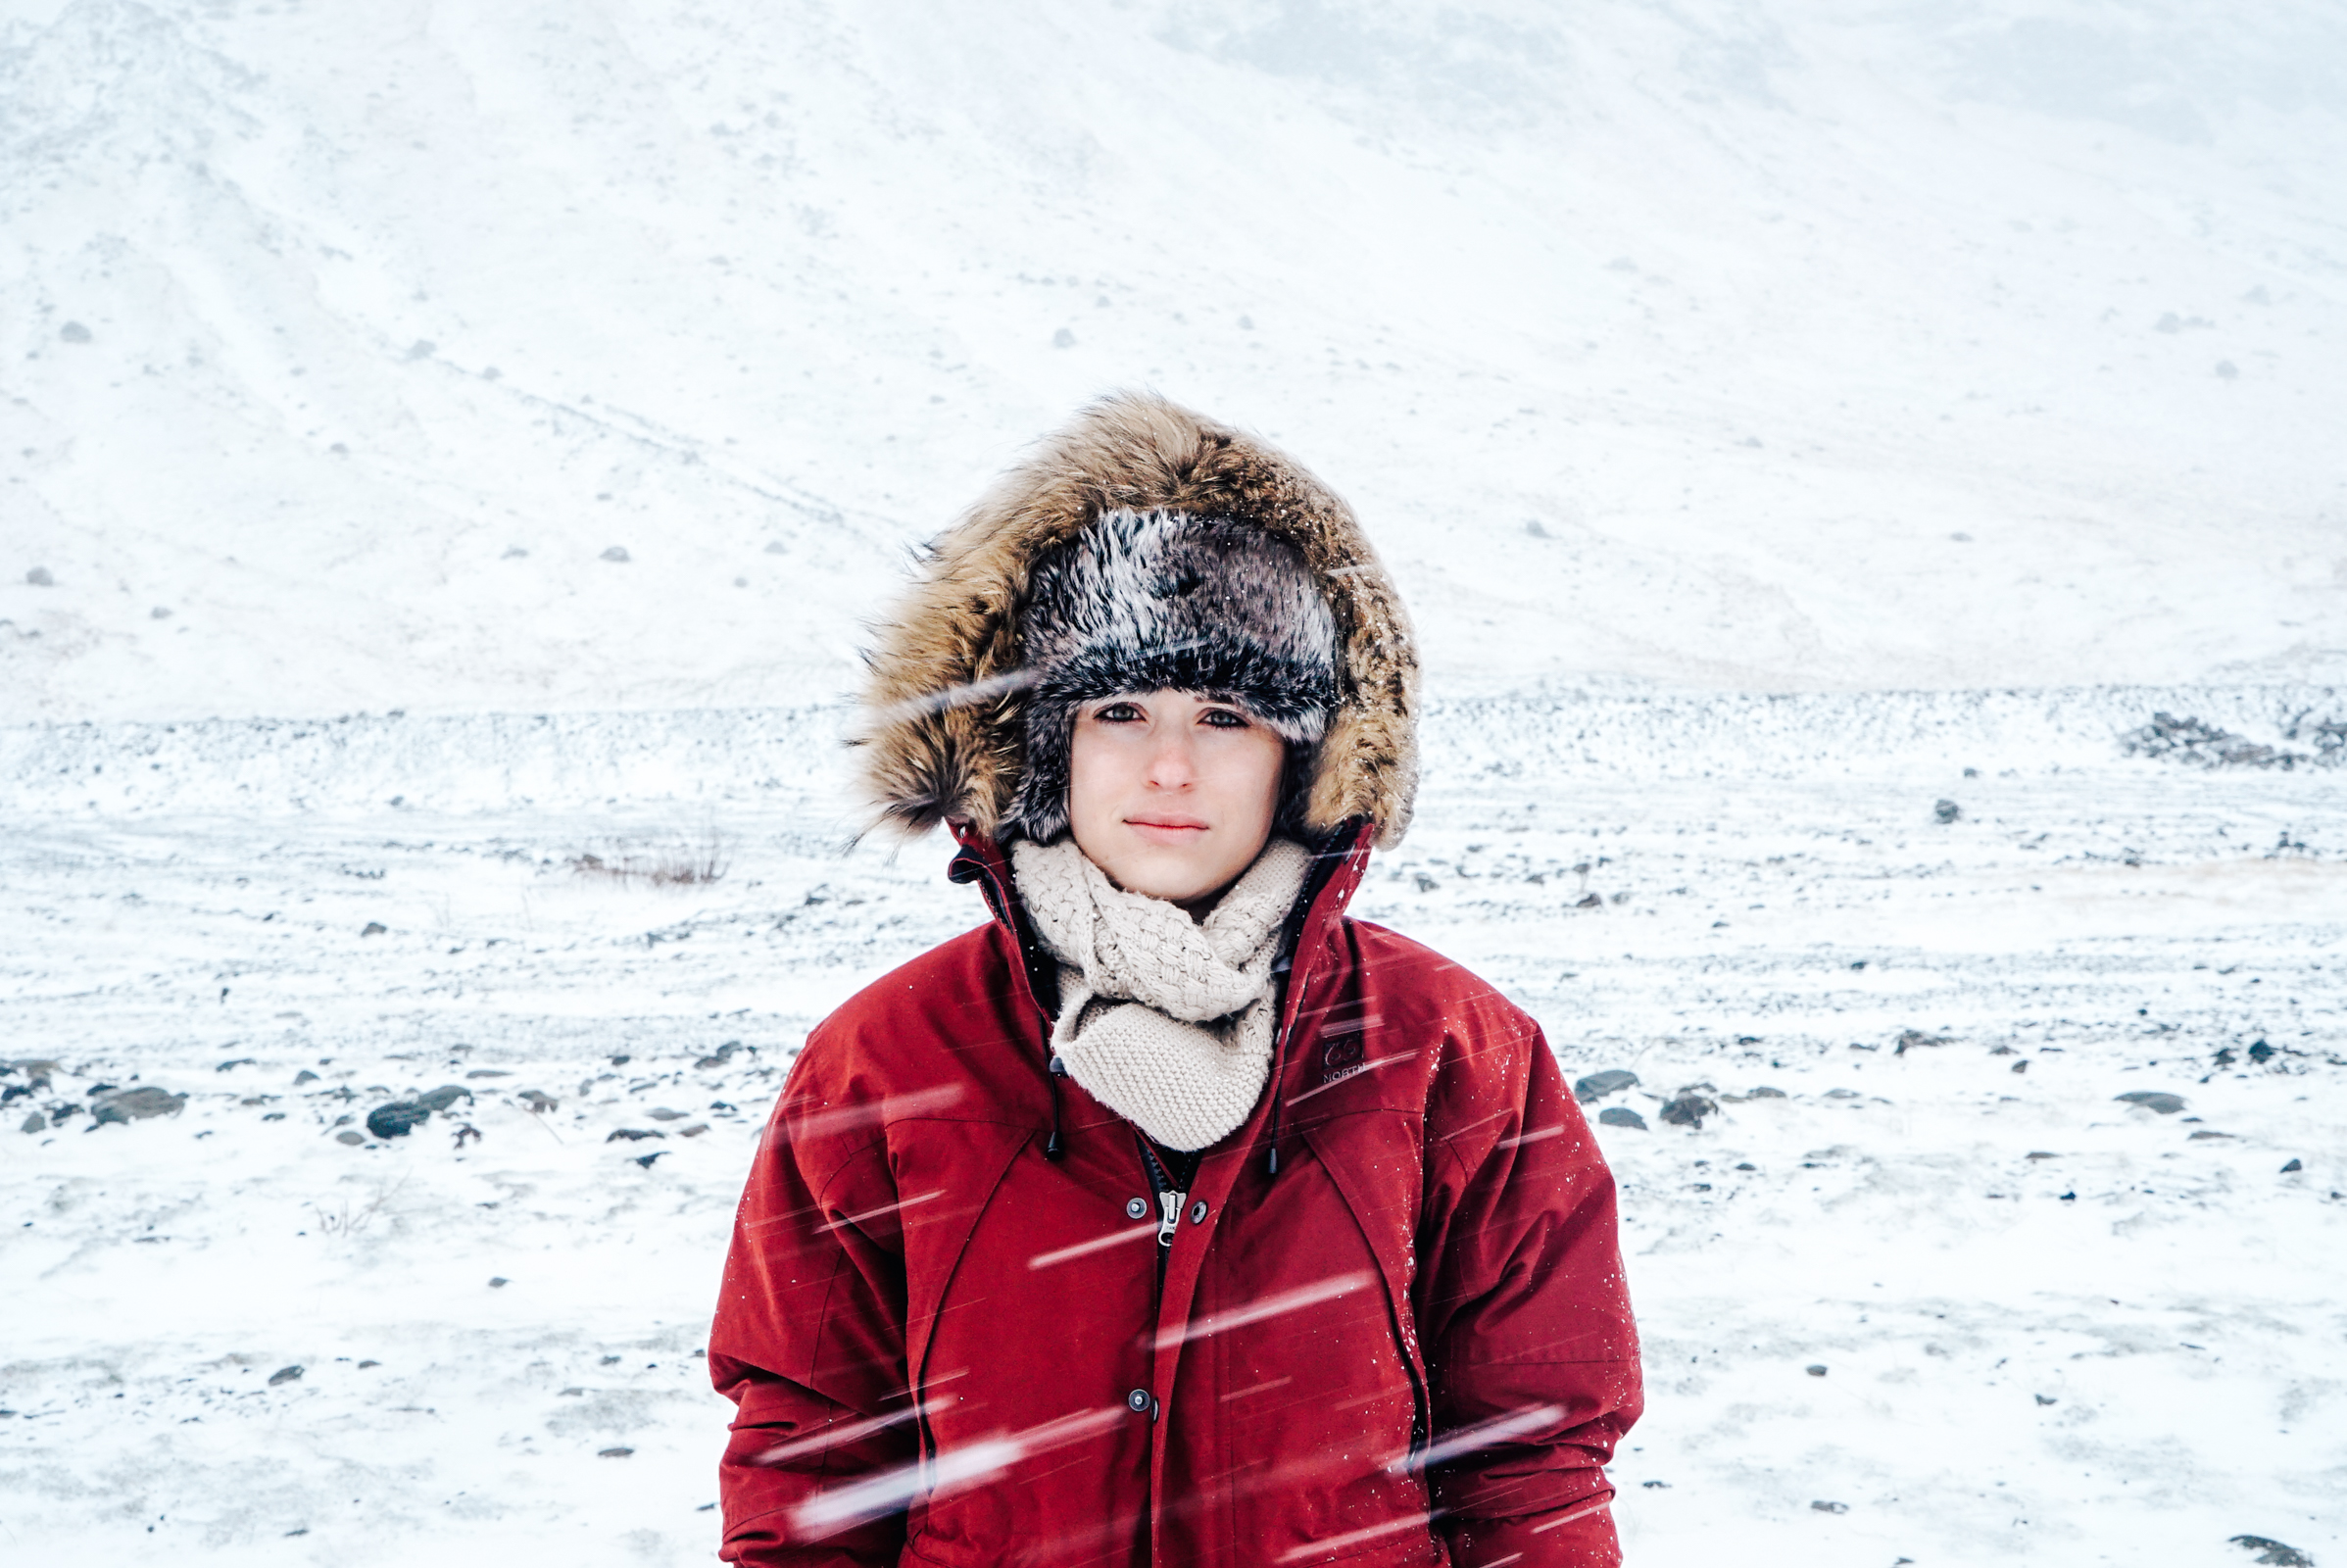 66north-iceland-5.jpg